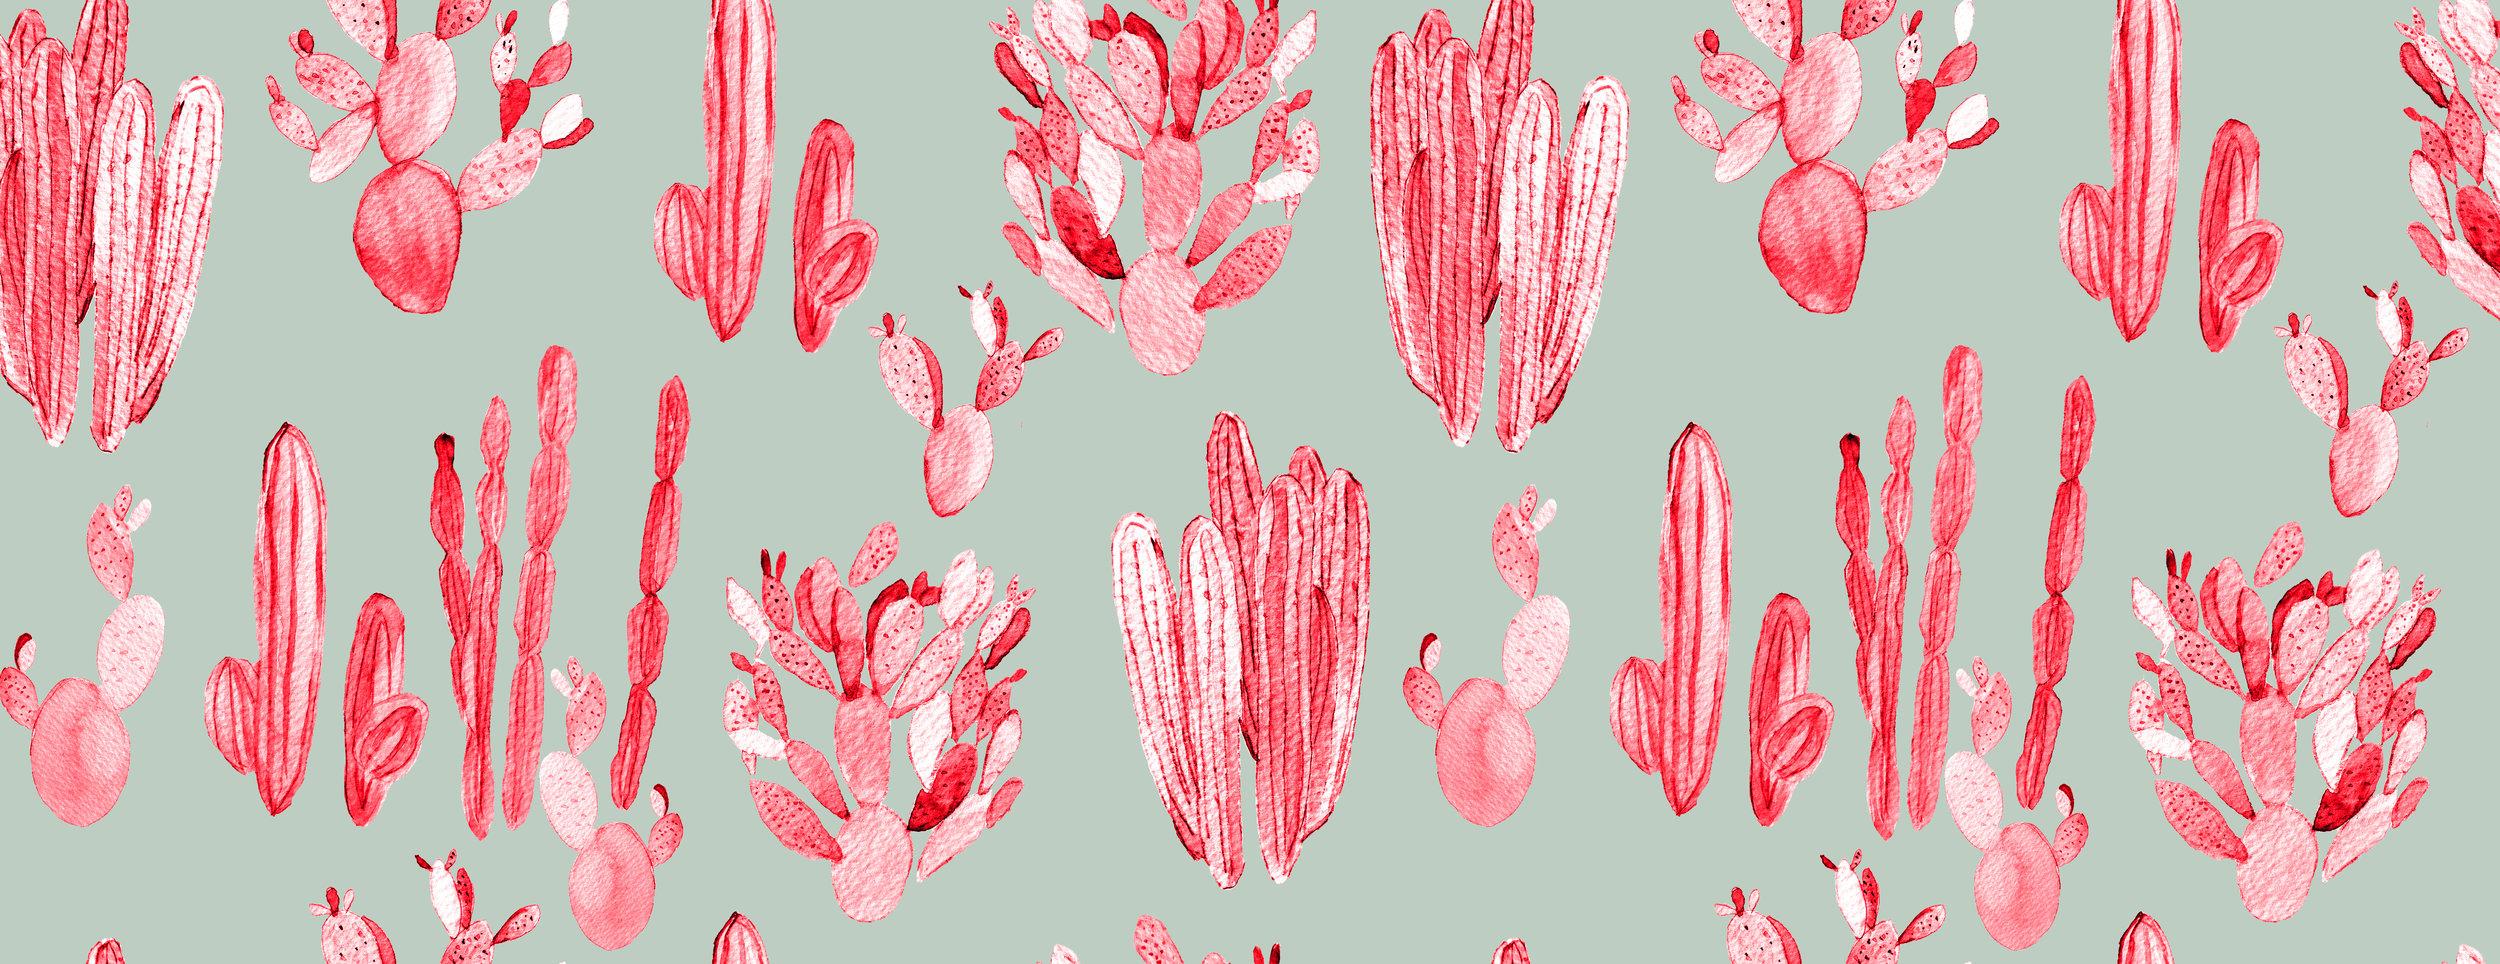 cactus_tile_coral_web.jpg